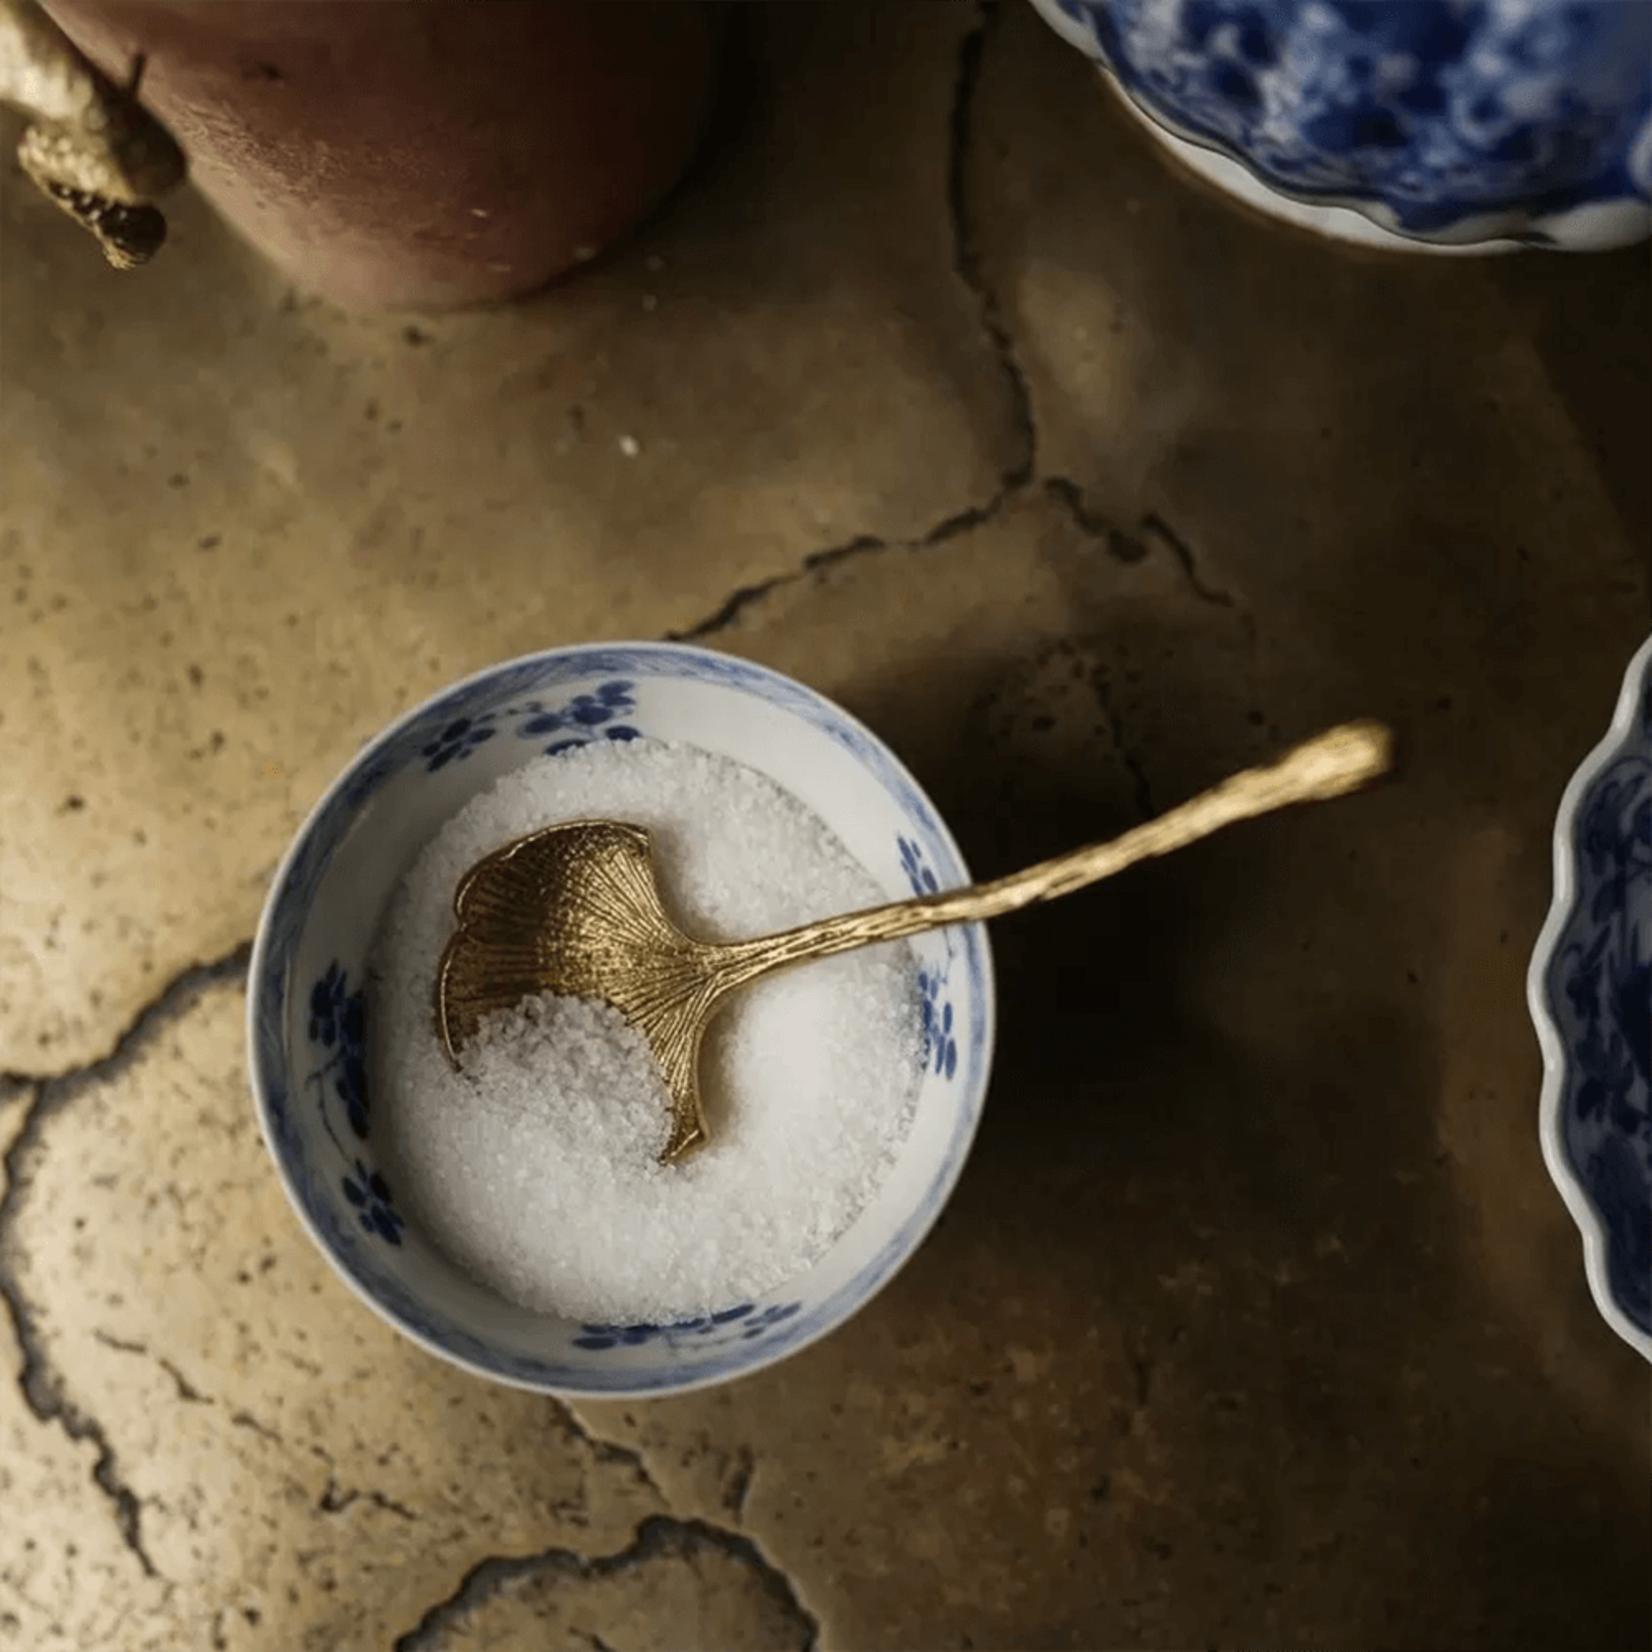 Indie Ginko Sugar & Spice Spoon